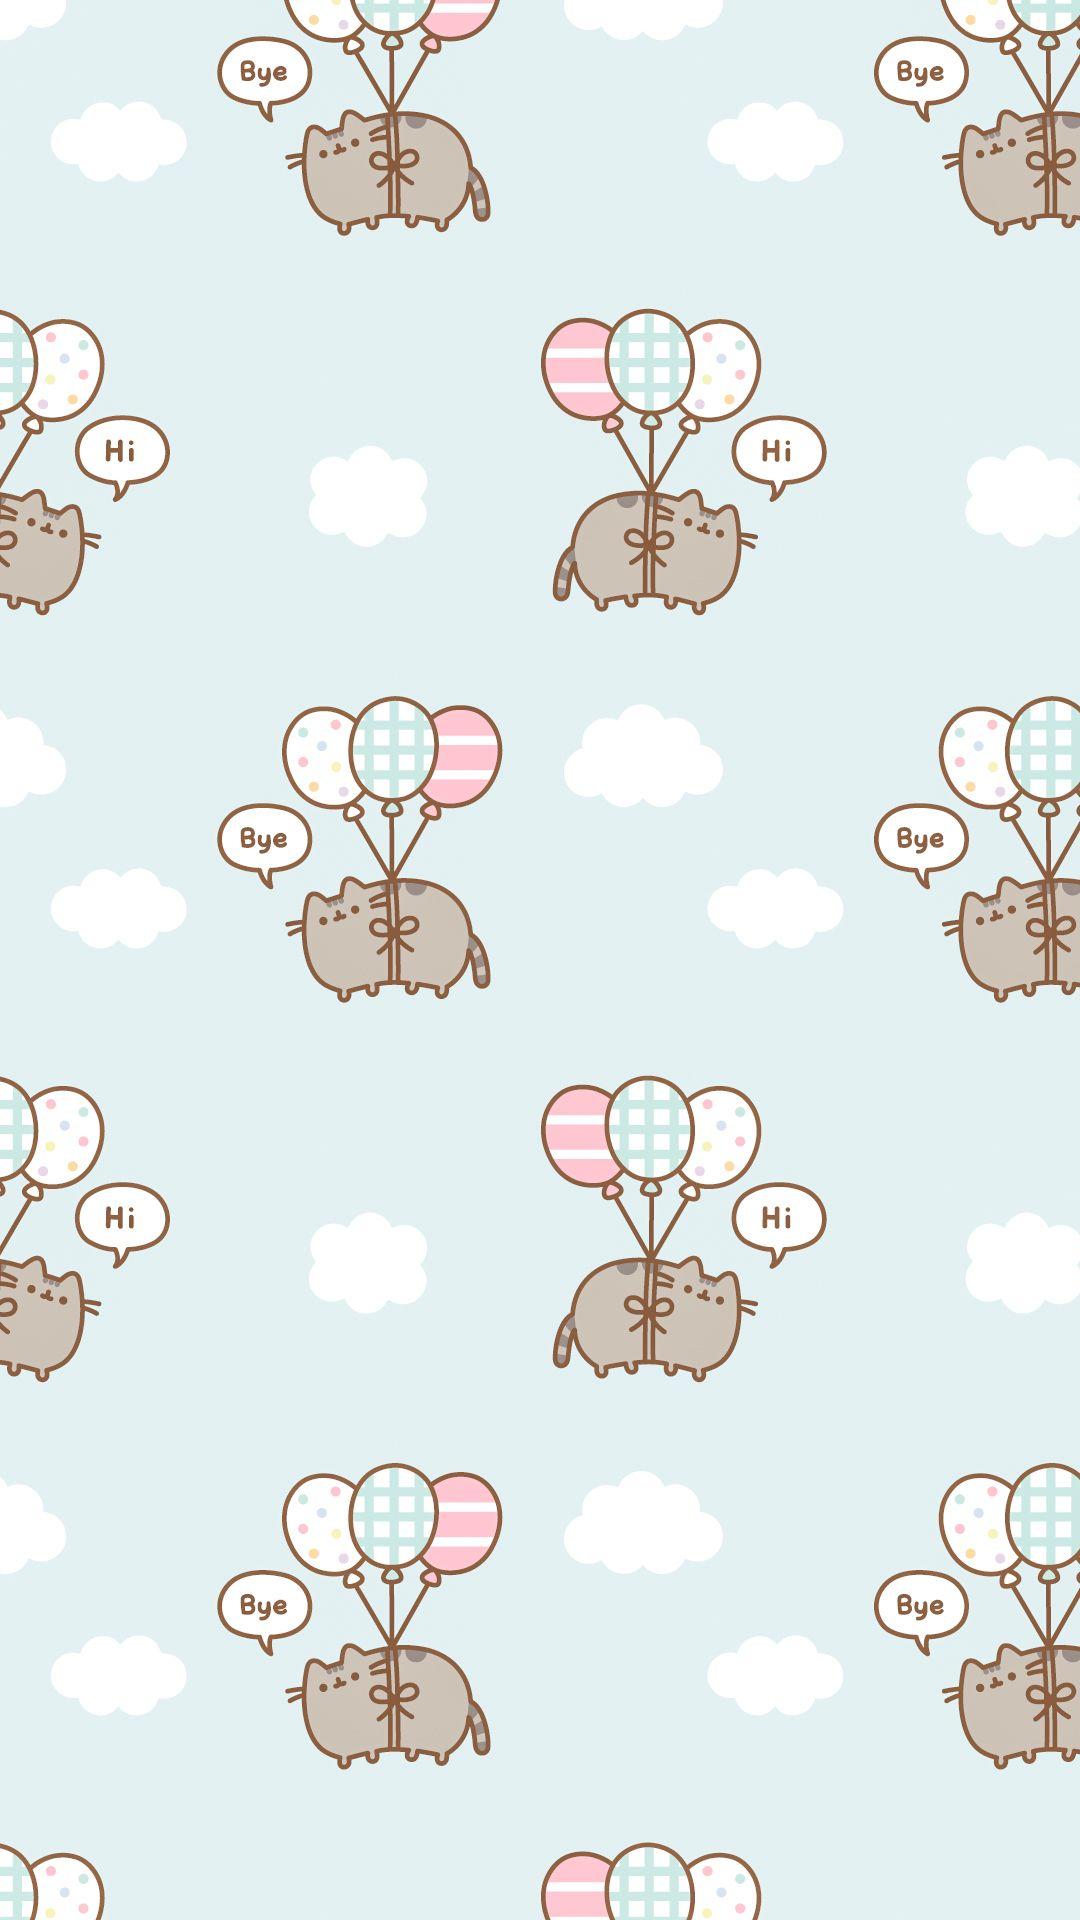 Pin by Jessica Grant 🦄 on Pusheen Cute cartoon